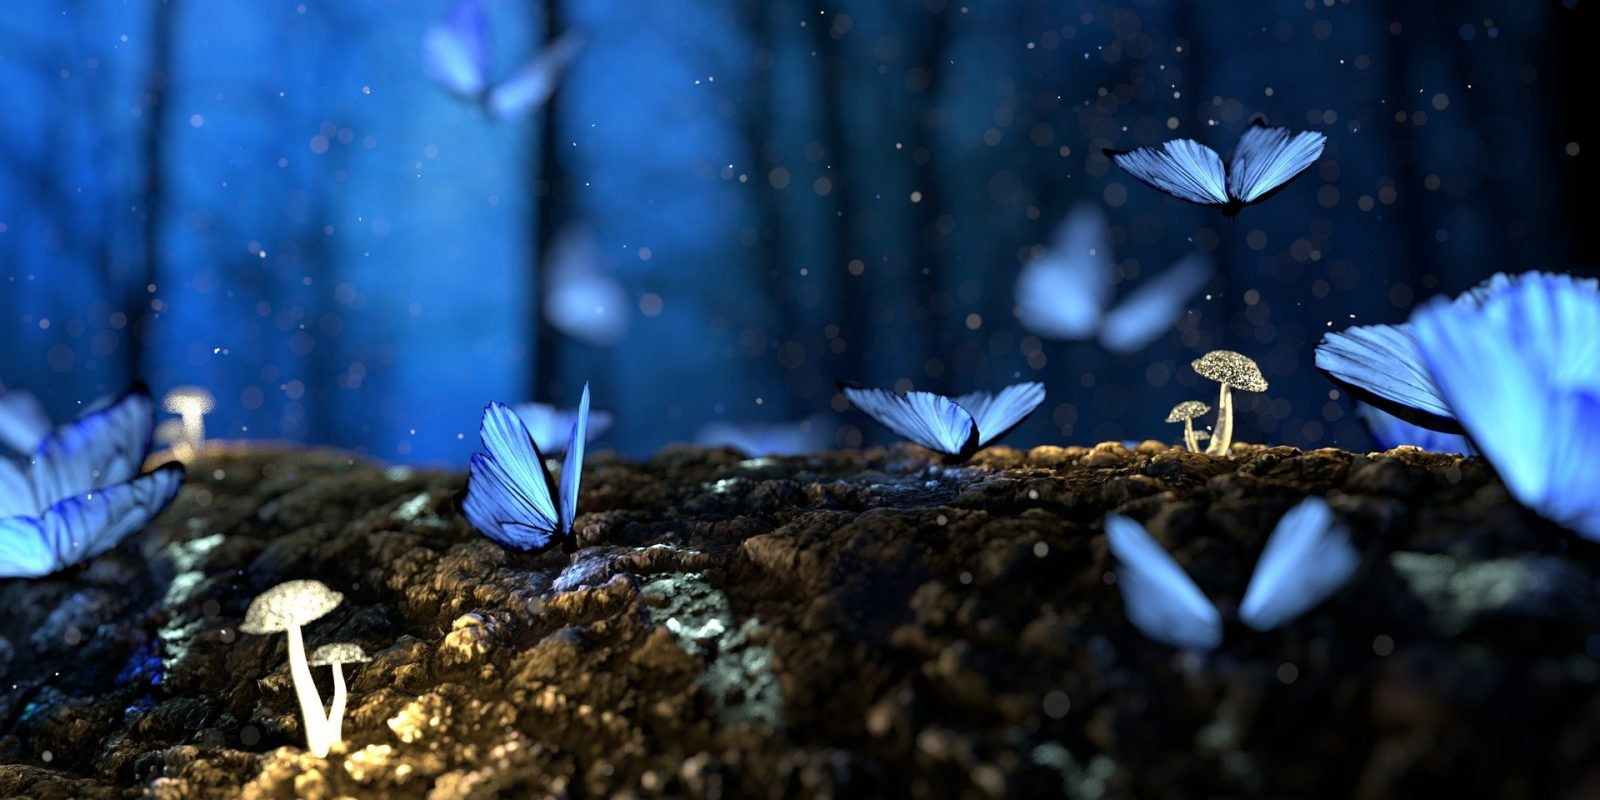 butterfly-2049567_1920 -Игорь Левченко de Pixabay